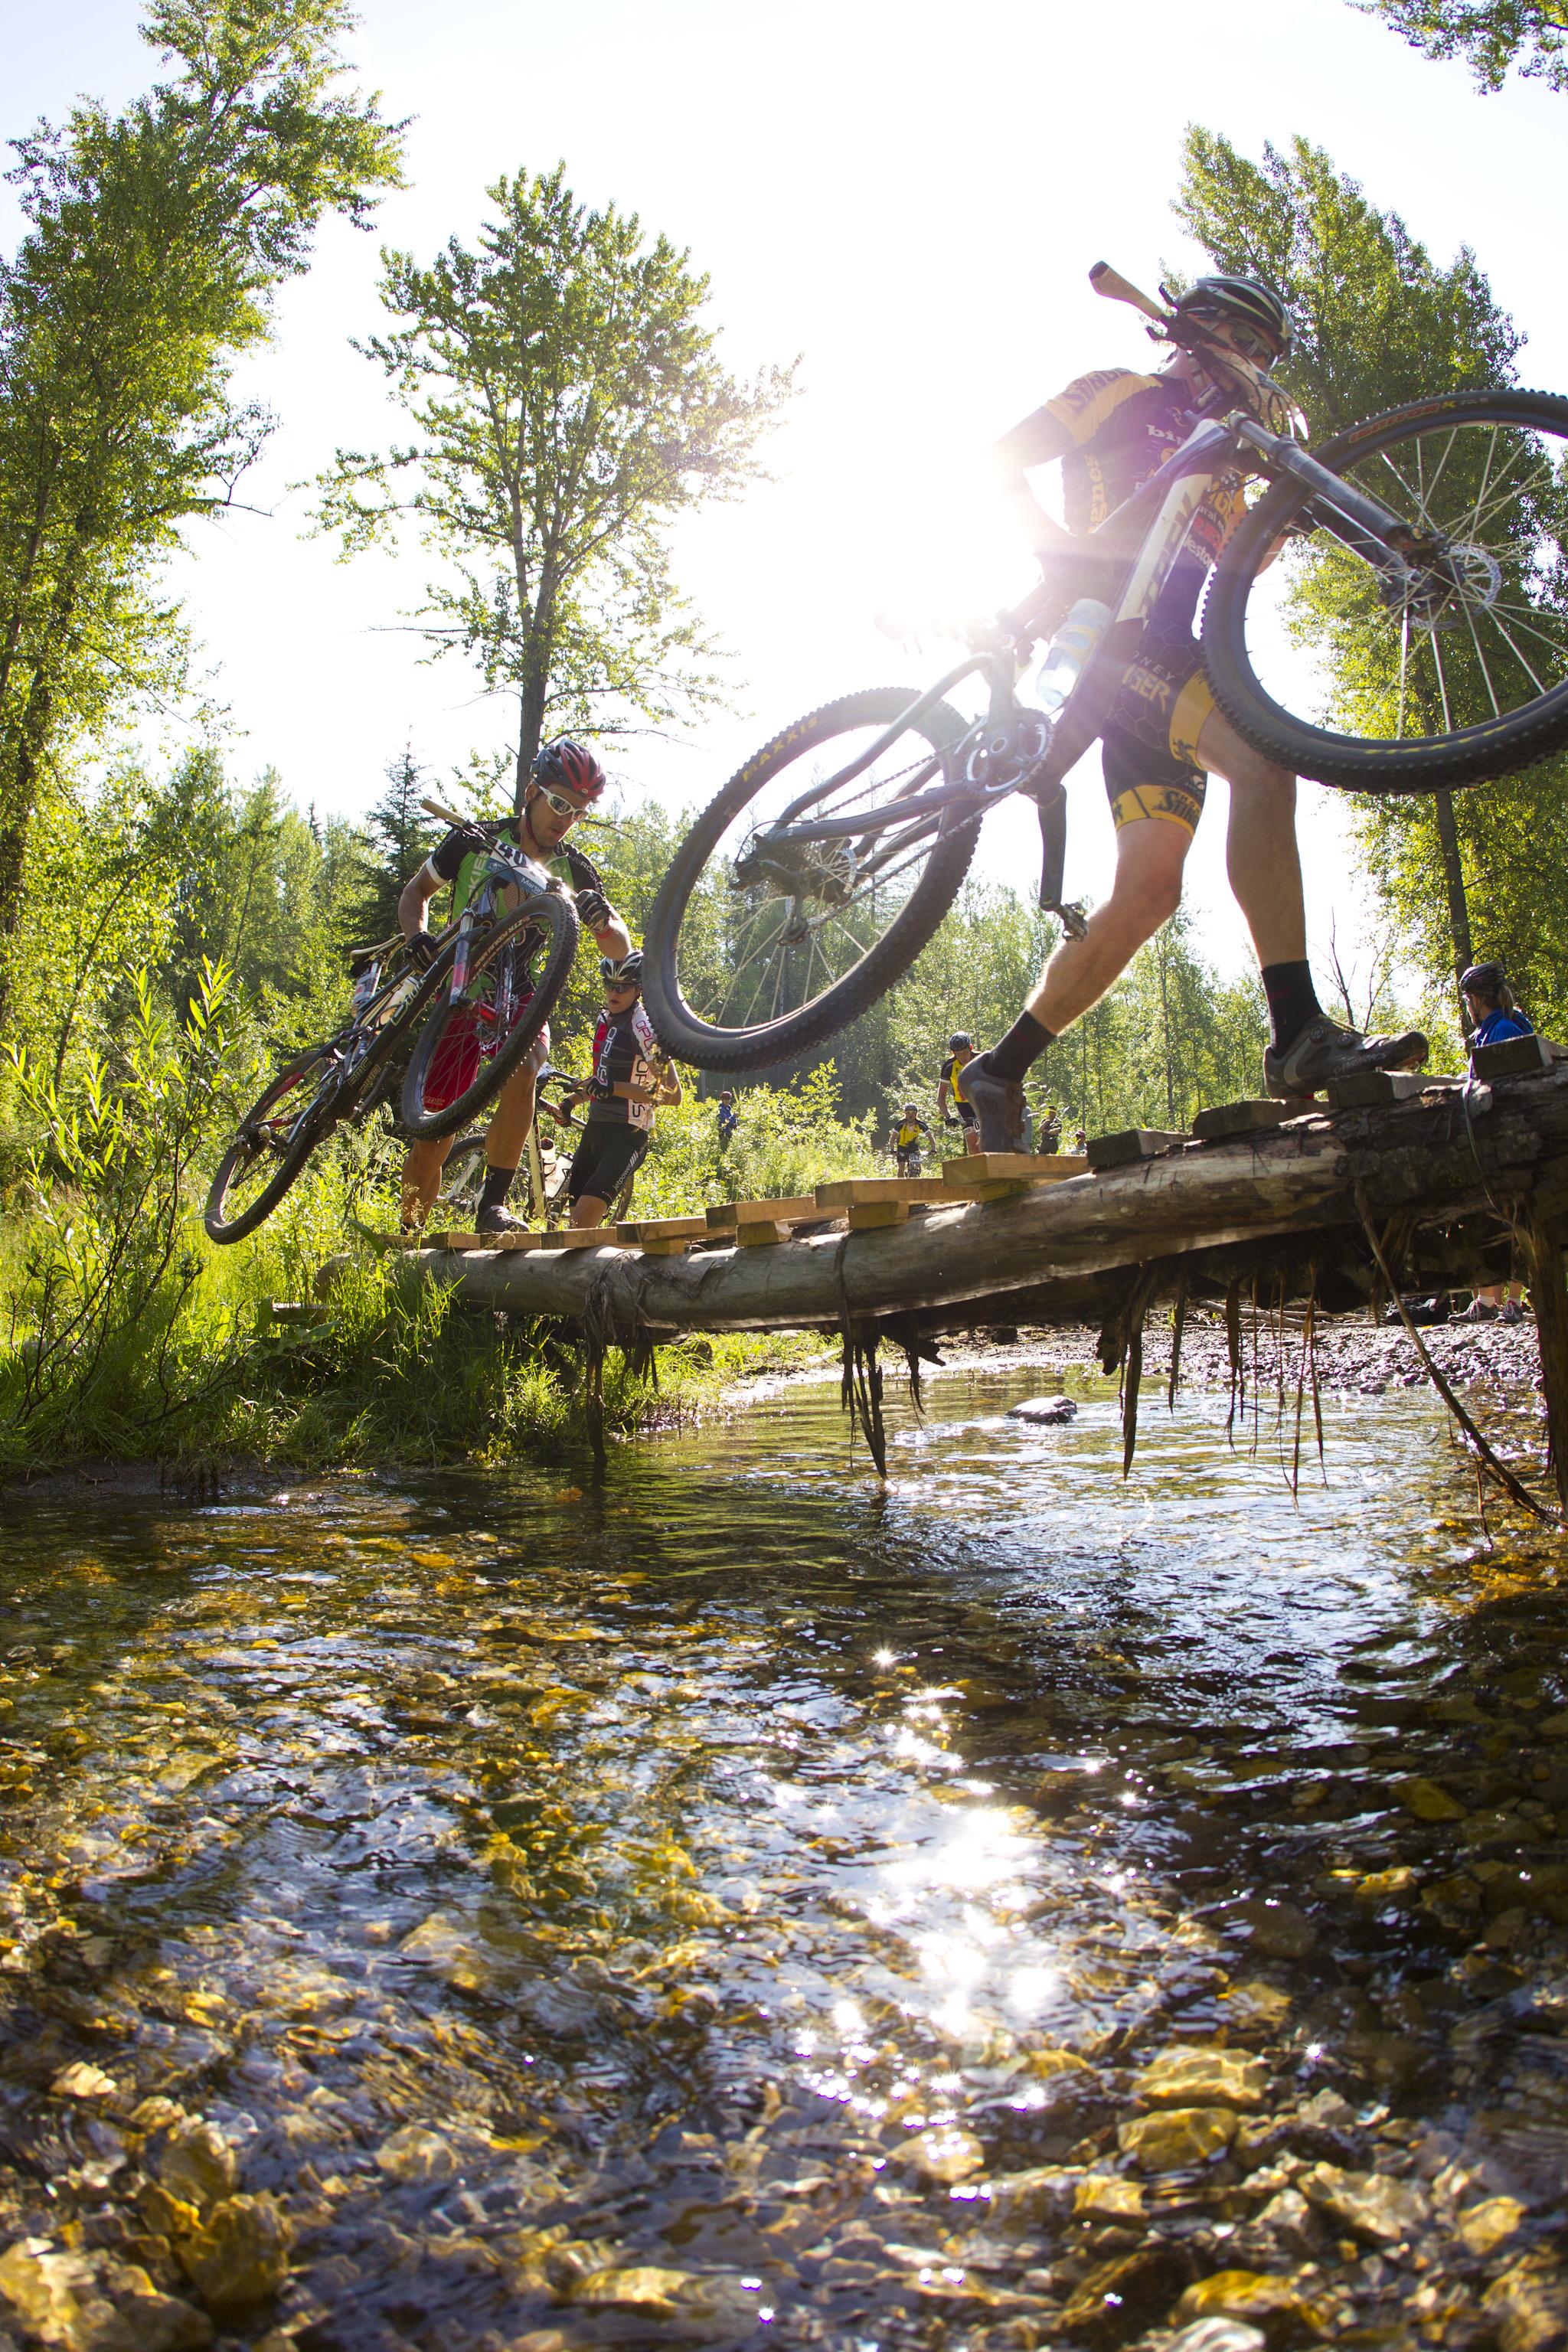 TransRockies Classic mountain bike stage race – stream crossing